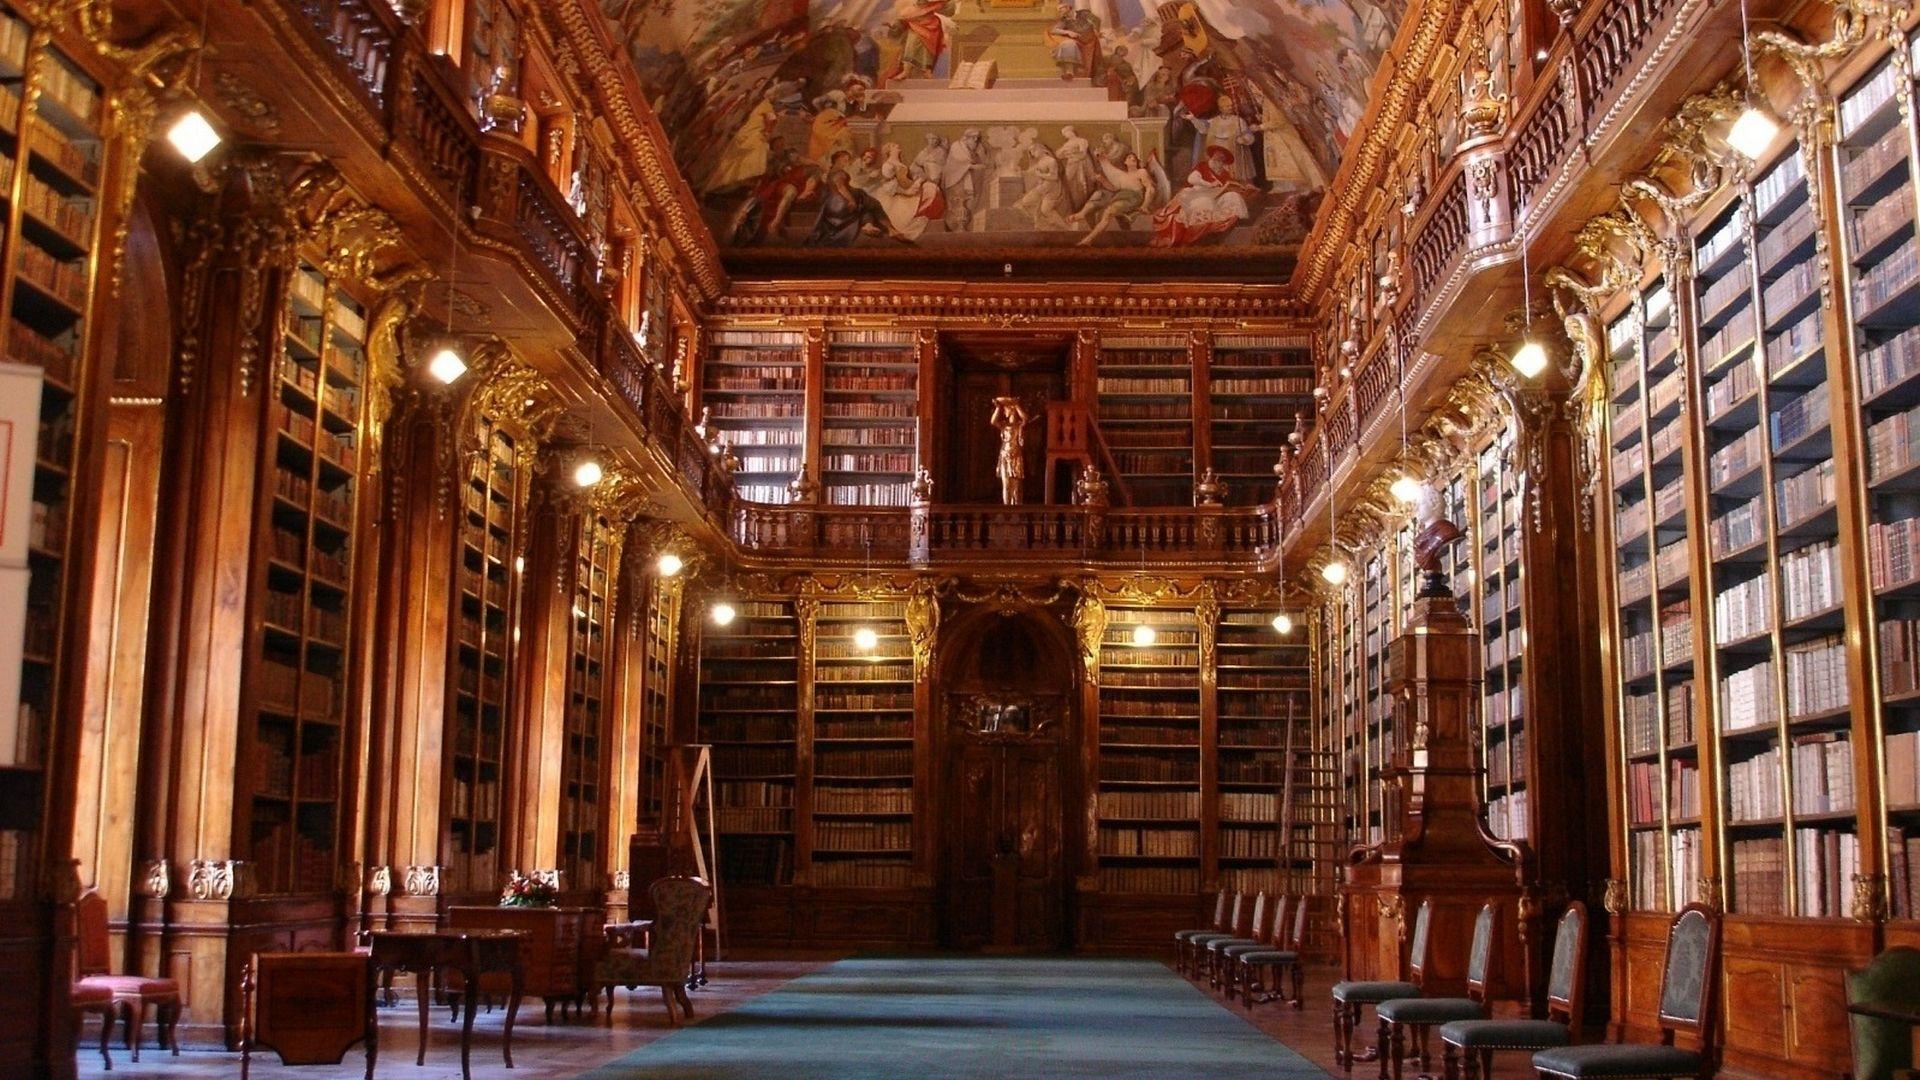 fond d 39 cran de vieille biblioth que vieilles biblioth ques pinterest livres de biblioth que. Black Bedroom Furniture Sets. Home Design Ideas